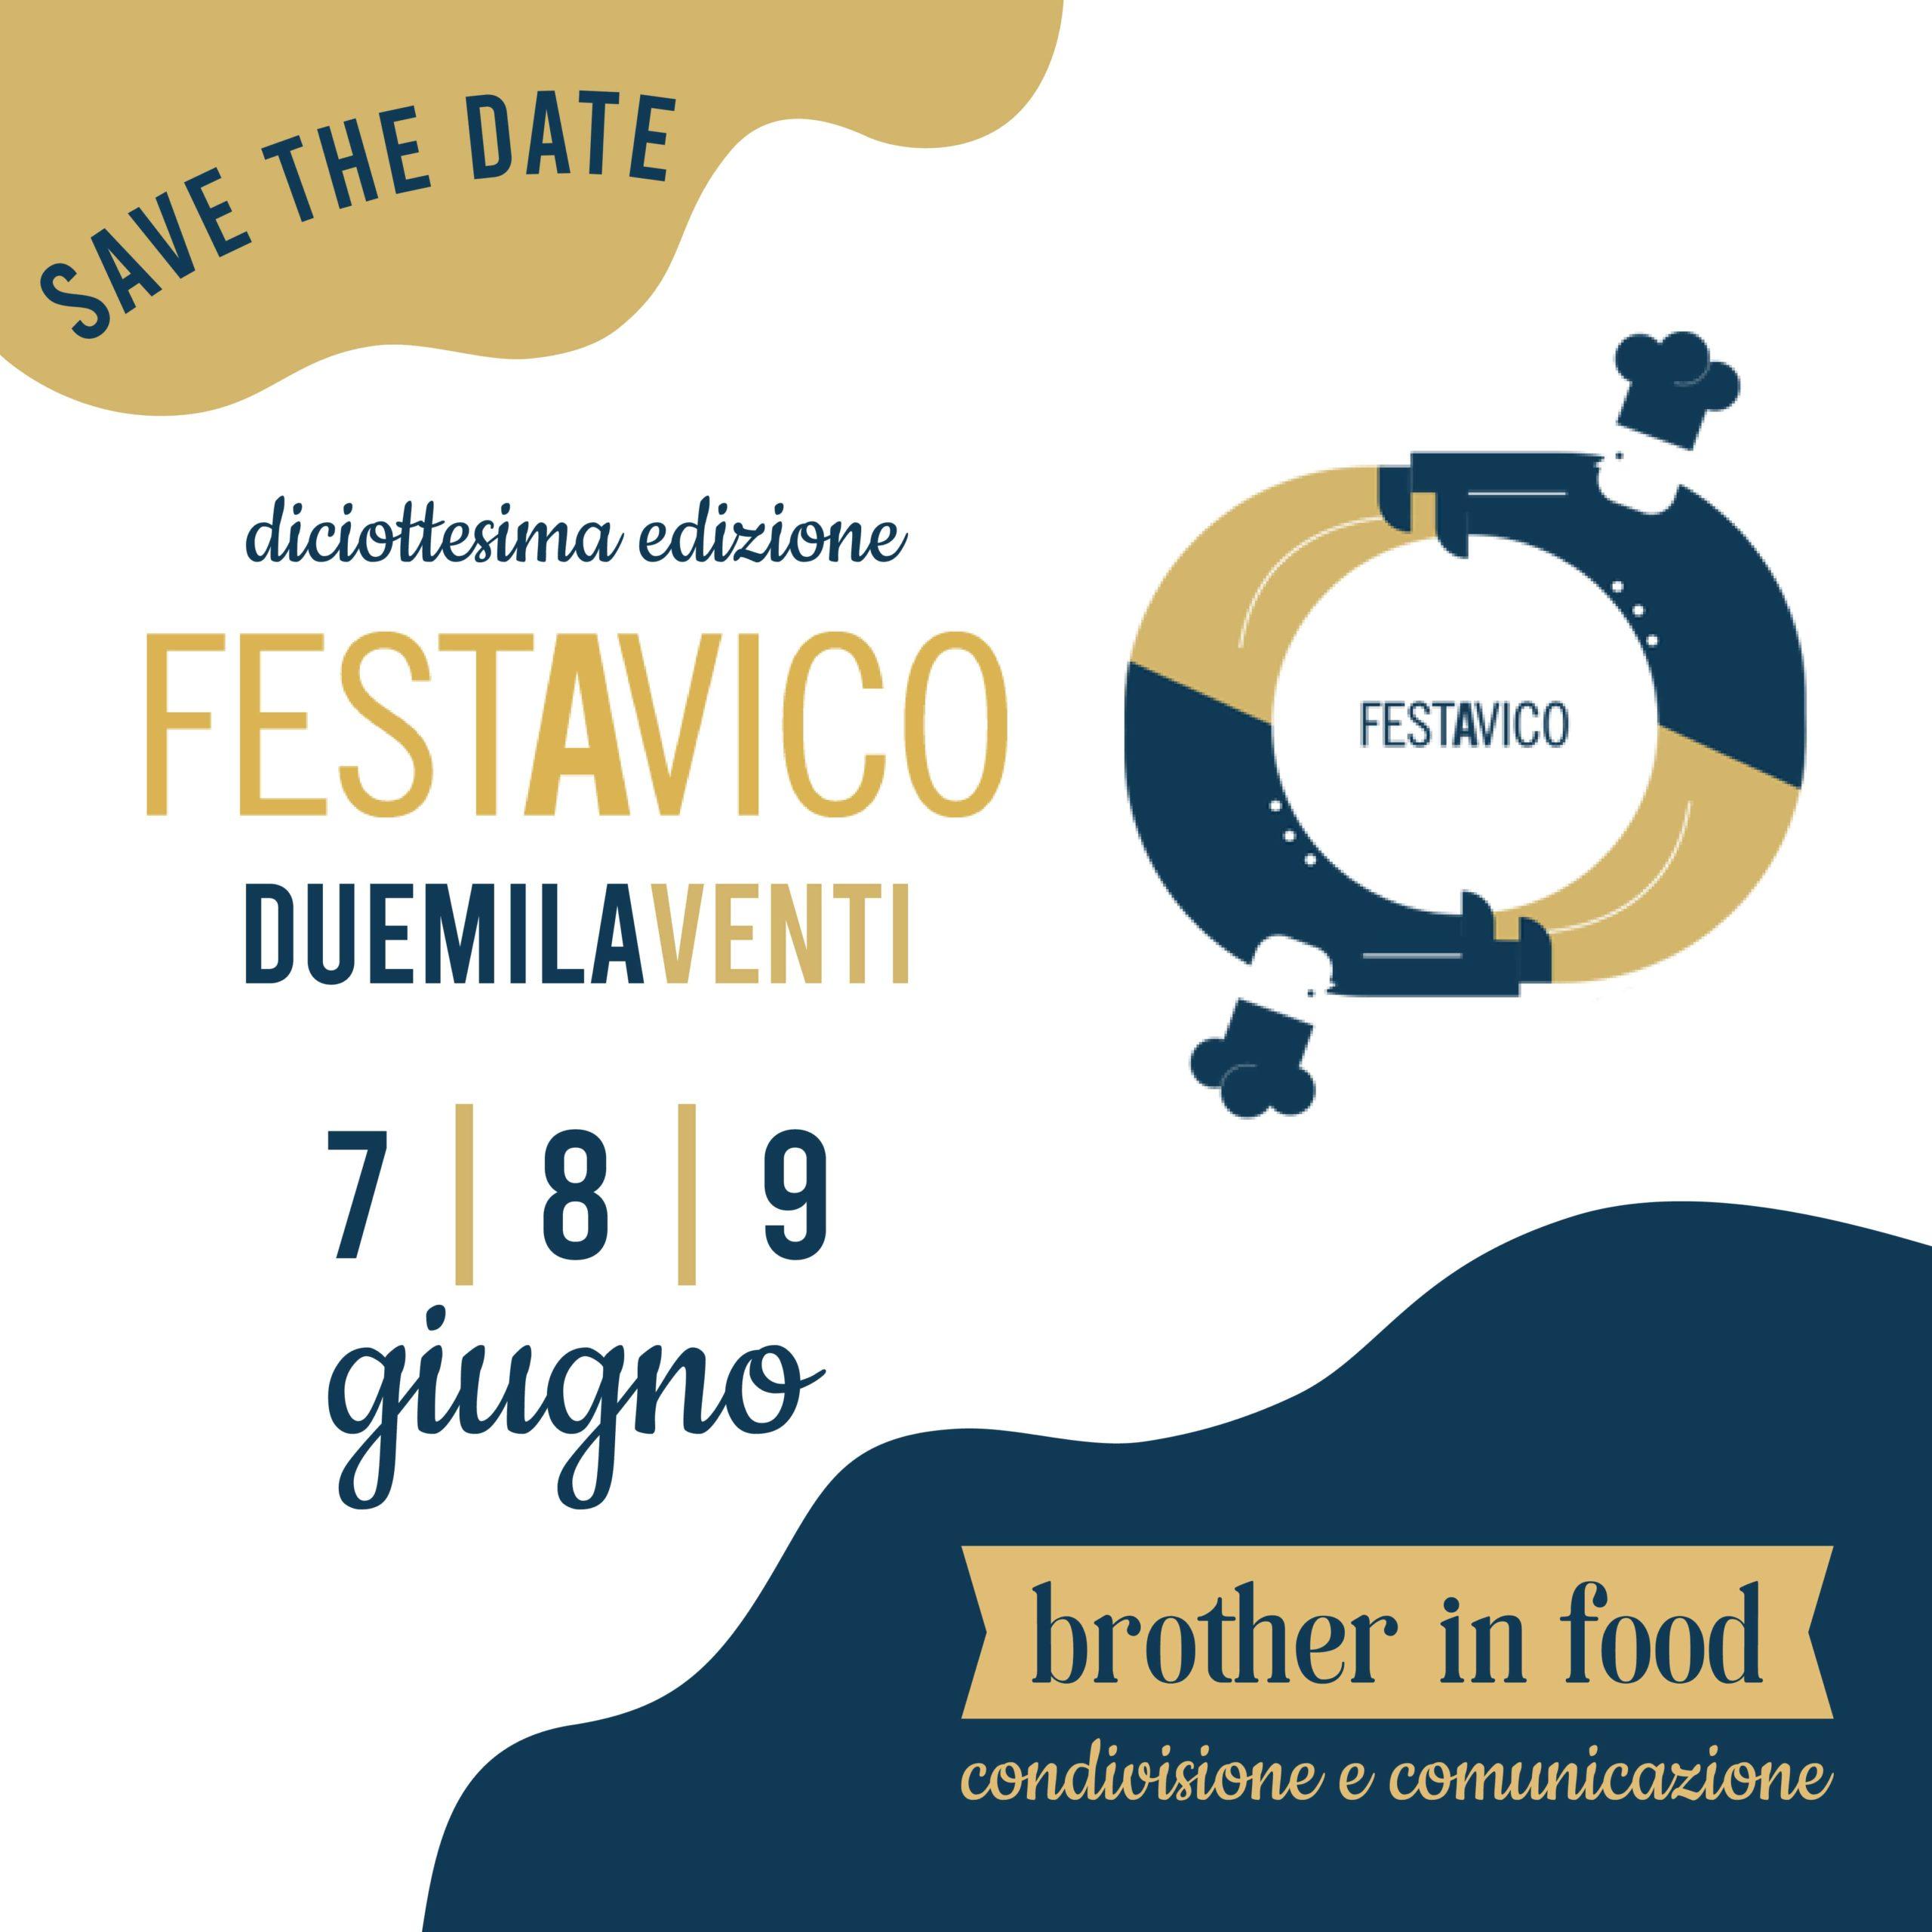 FESTAVICO-01-min